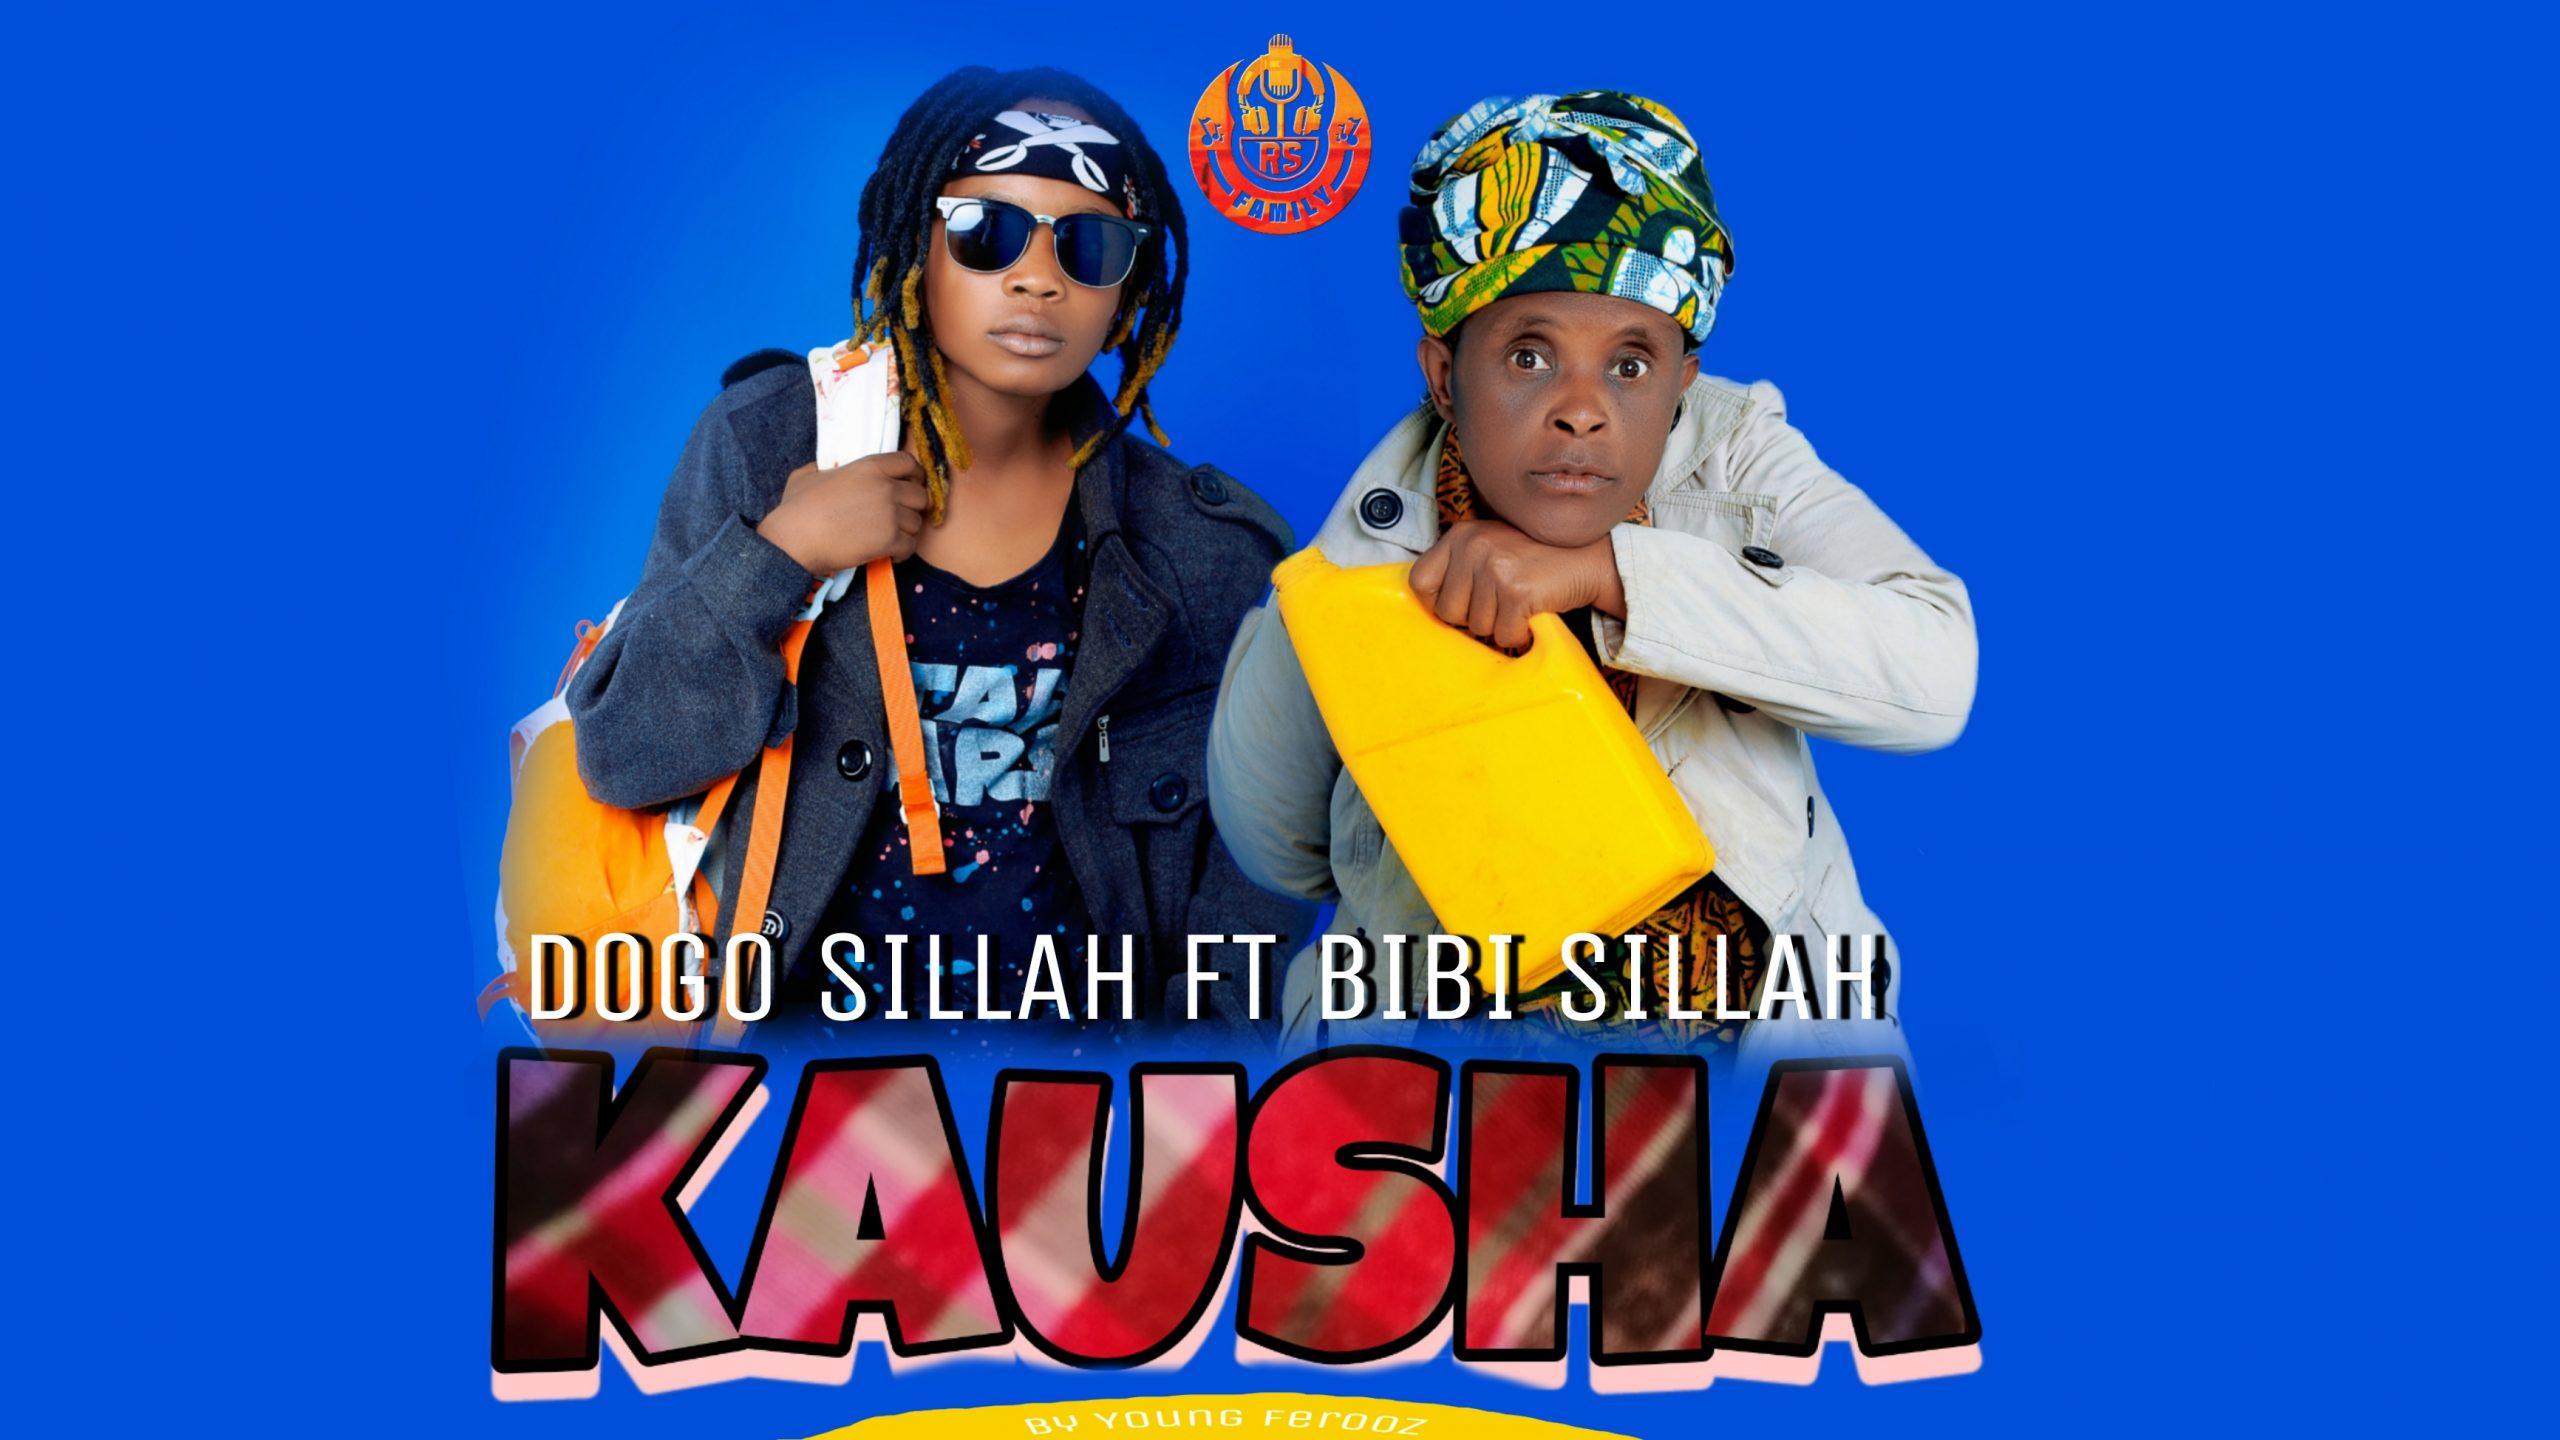 AUDIO | Dogo sillah Ft. Bibi sillah – Kausha | Download